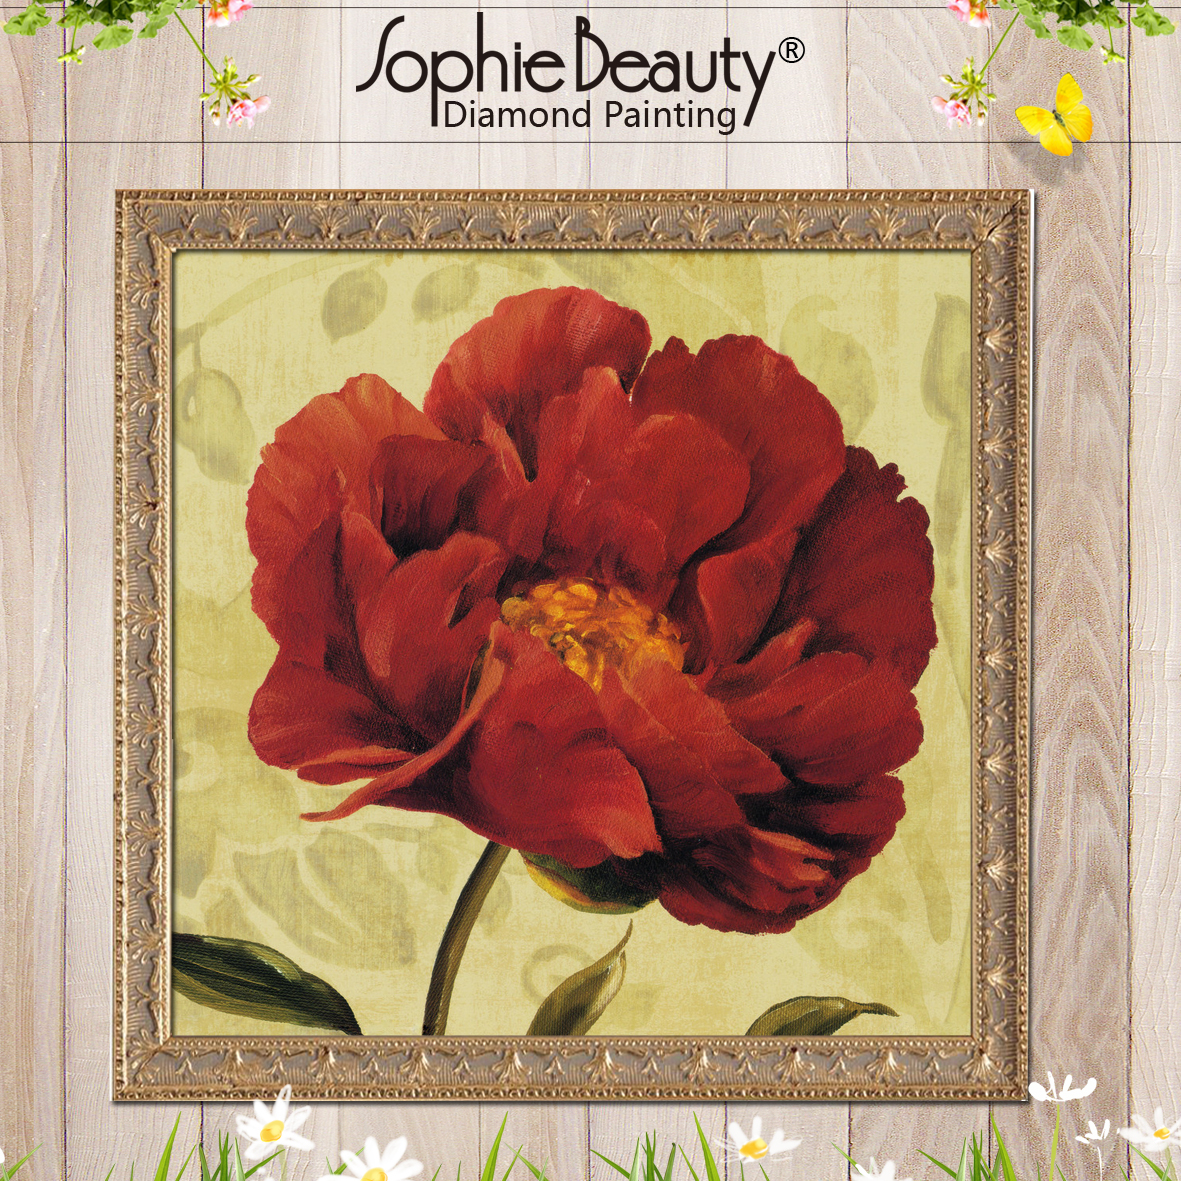 Sophie Beauty Hot Diy Round Square Diamond Painting Cross Stitch